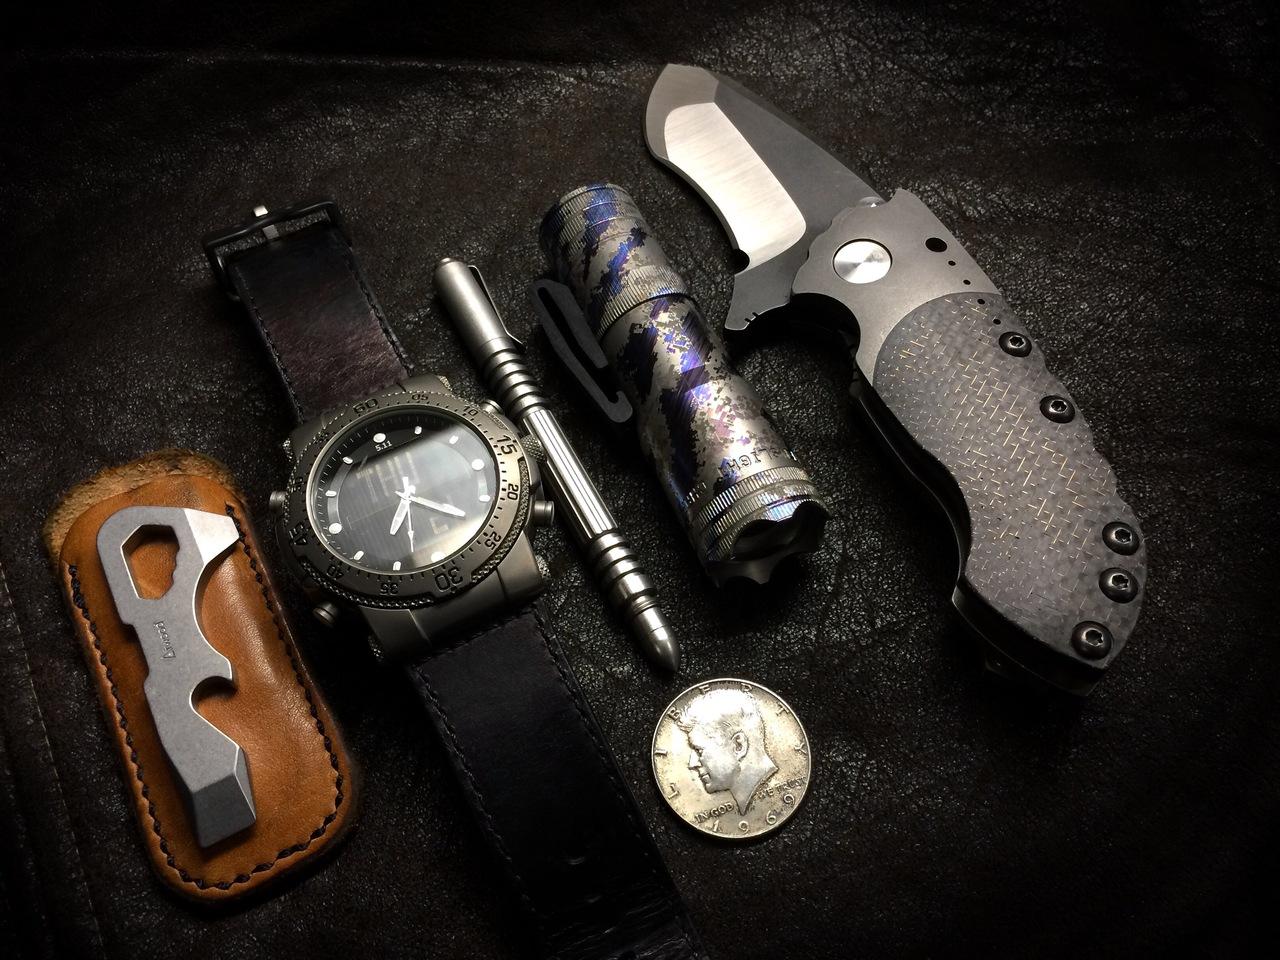 im-prepared: Atwood G3 Mini Keyton Pocket Tool Ti 5.11H.R.T. Watch Zero Tolerance Custom Knive Ti Lens Light Mini